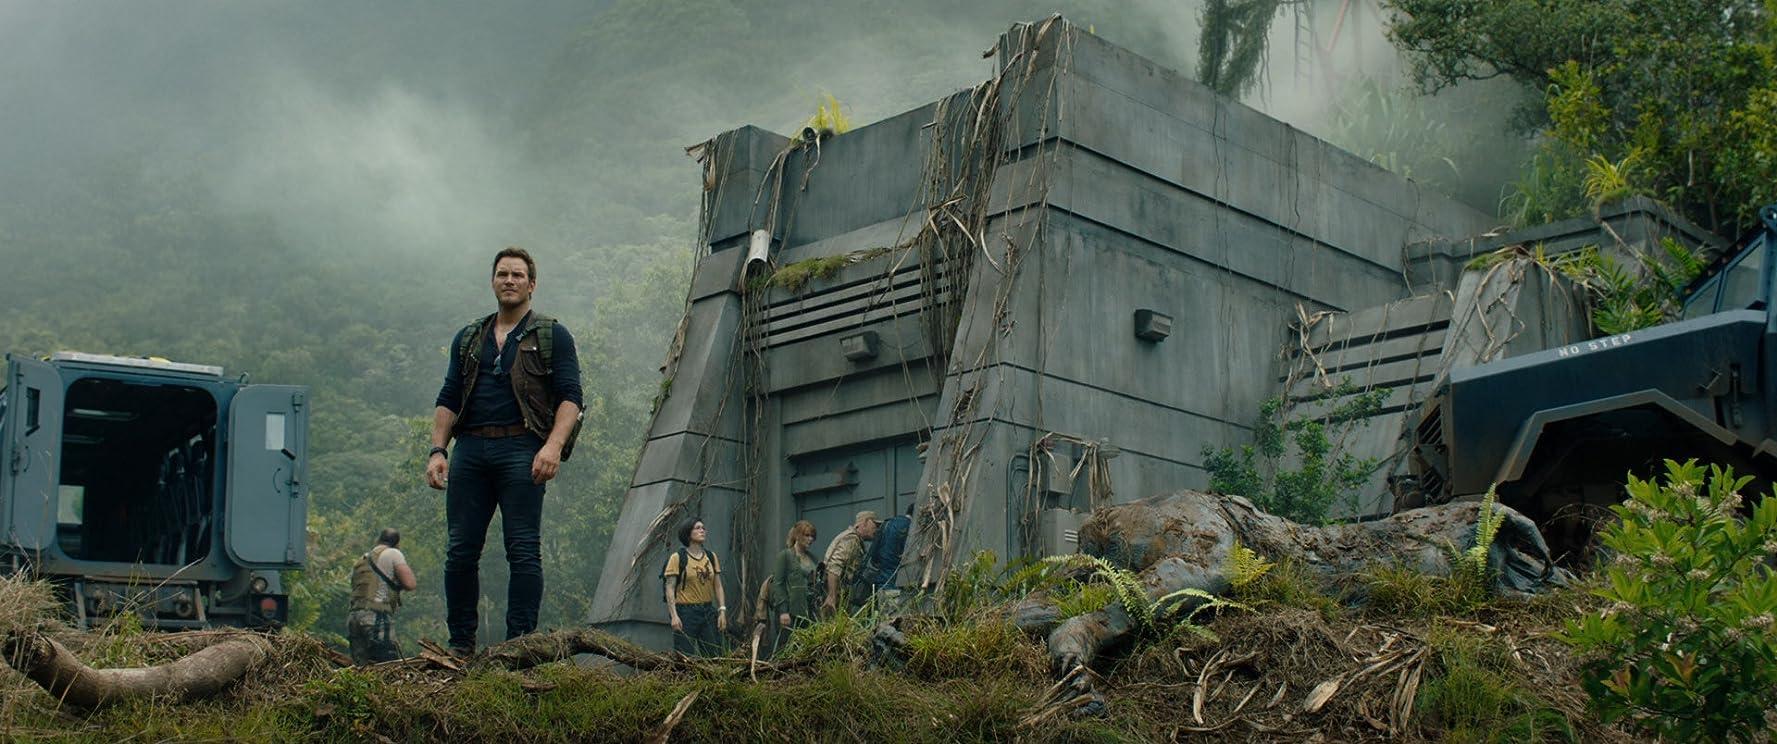 Ted Levine, Chris Pratt, Daniella Pineda, and Justice Smith in Jurassic World: Fallen Kingdom (2018)